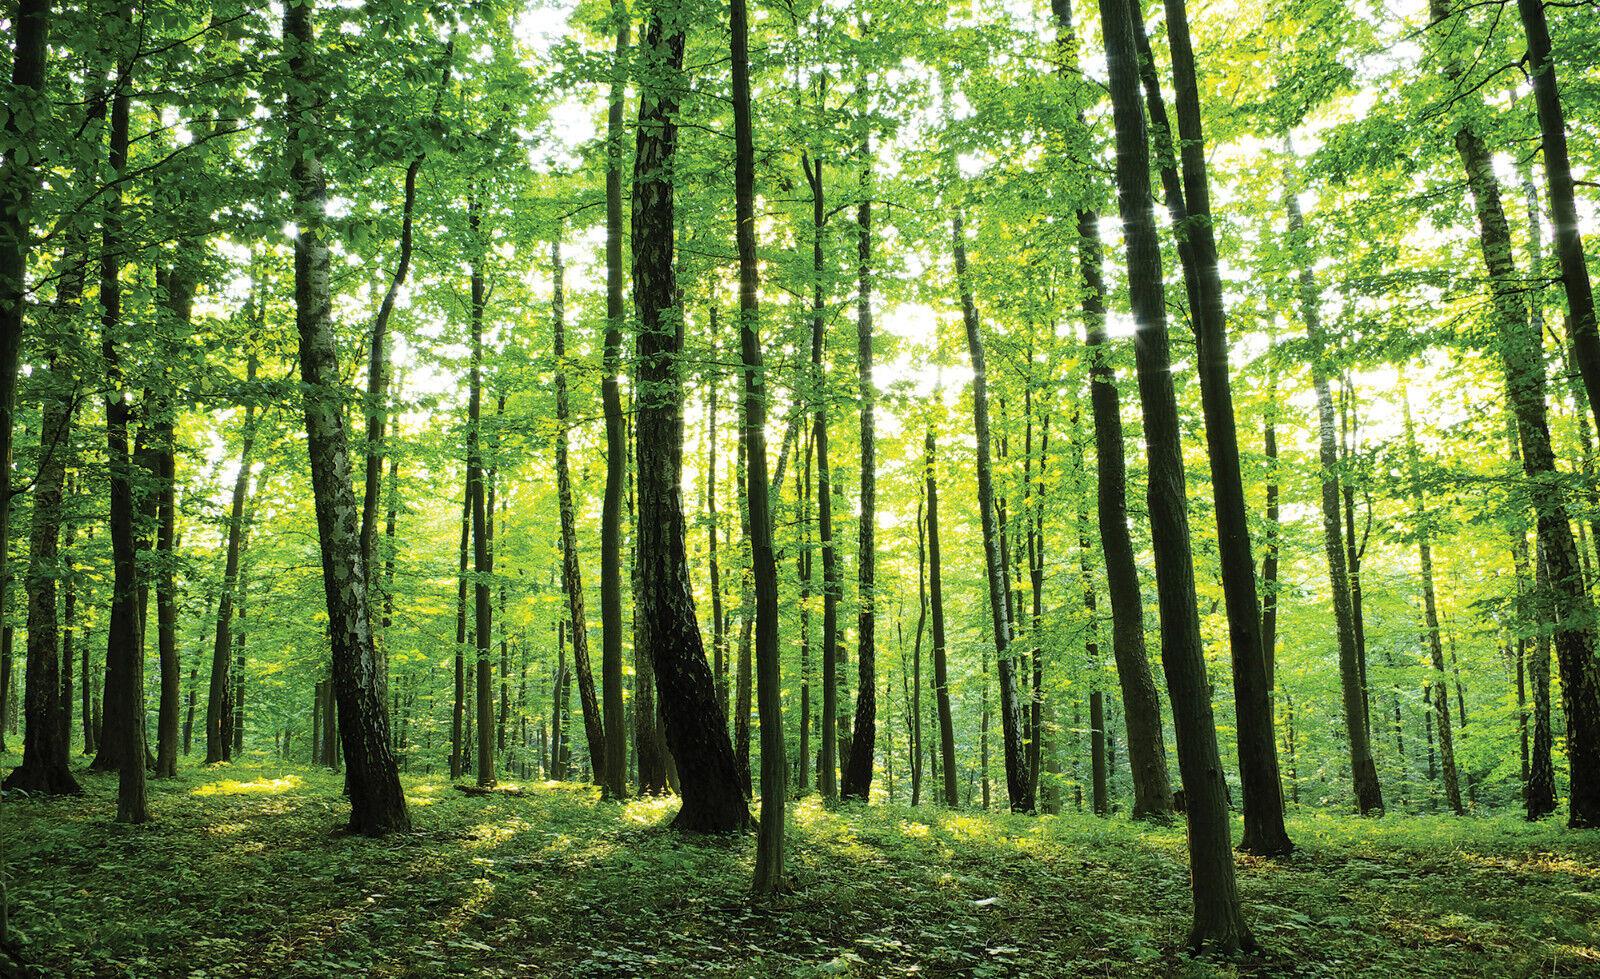 VLIES Fototapete-WALDLICHTUNG-(186)-Wald Bäume Sonne Grün Natur Landschaft xxl